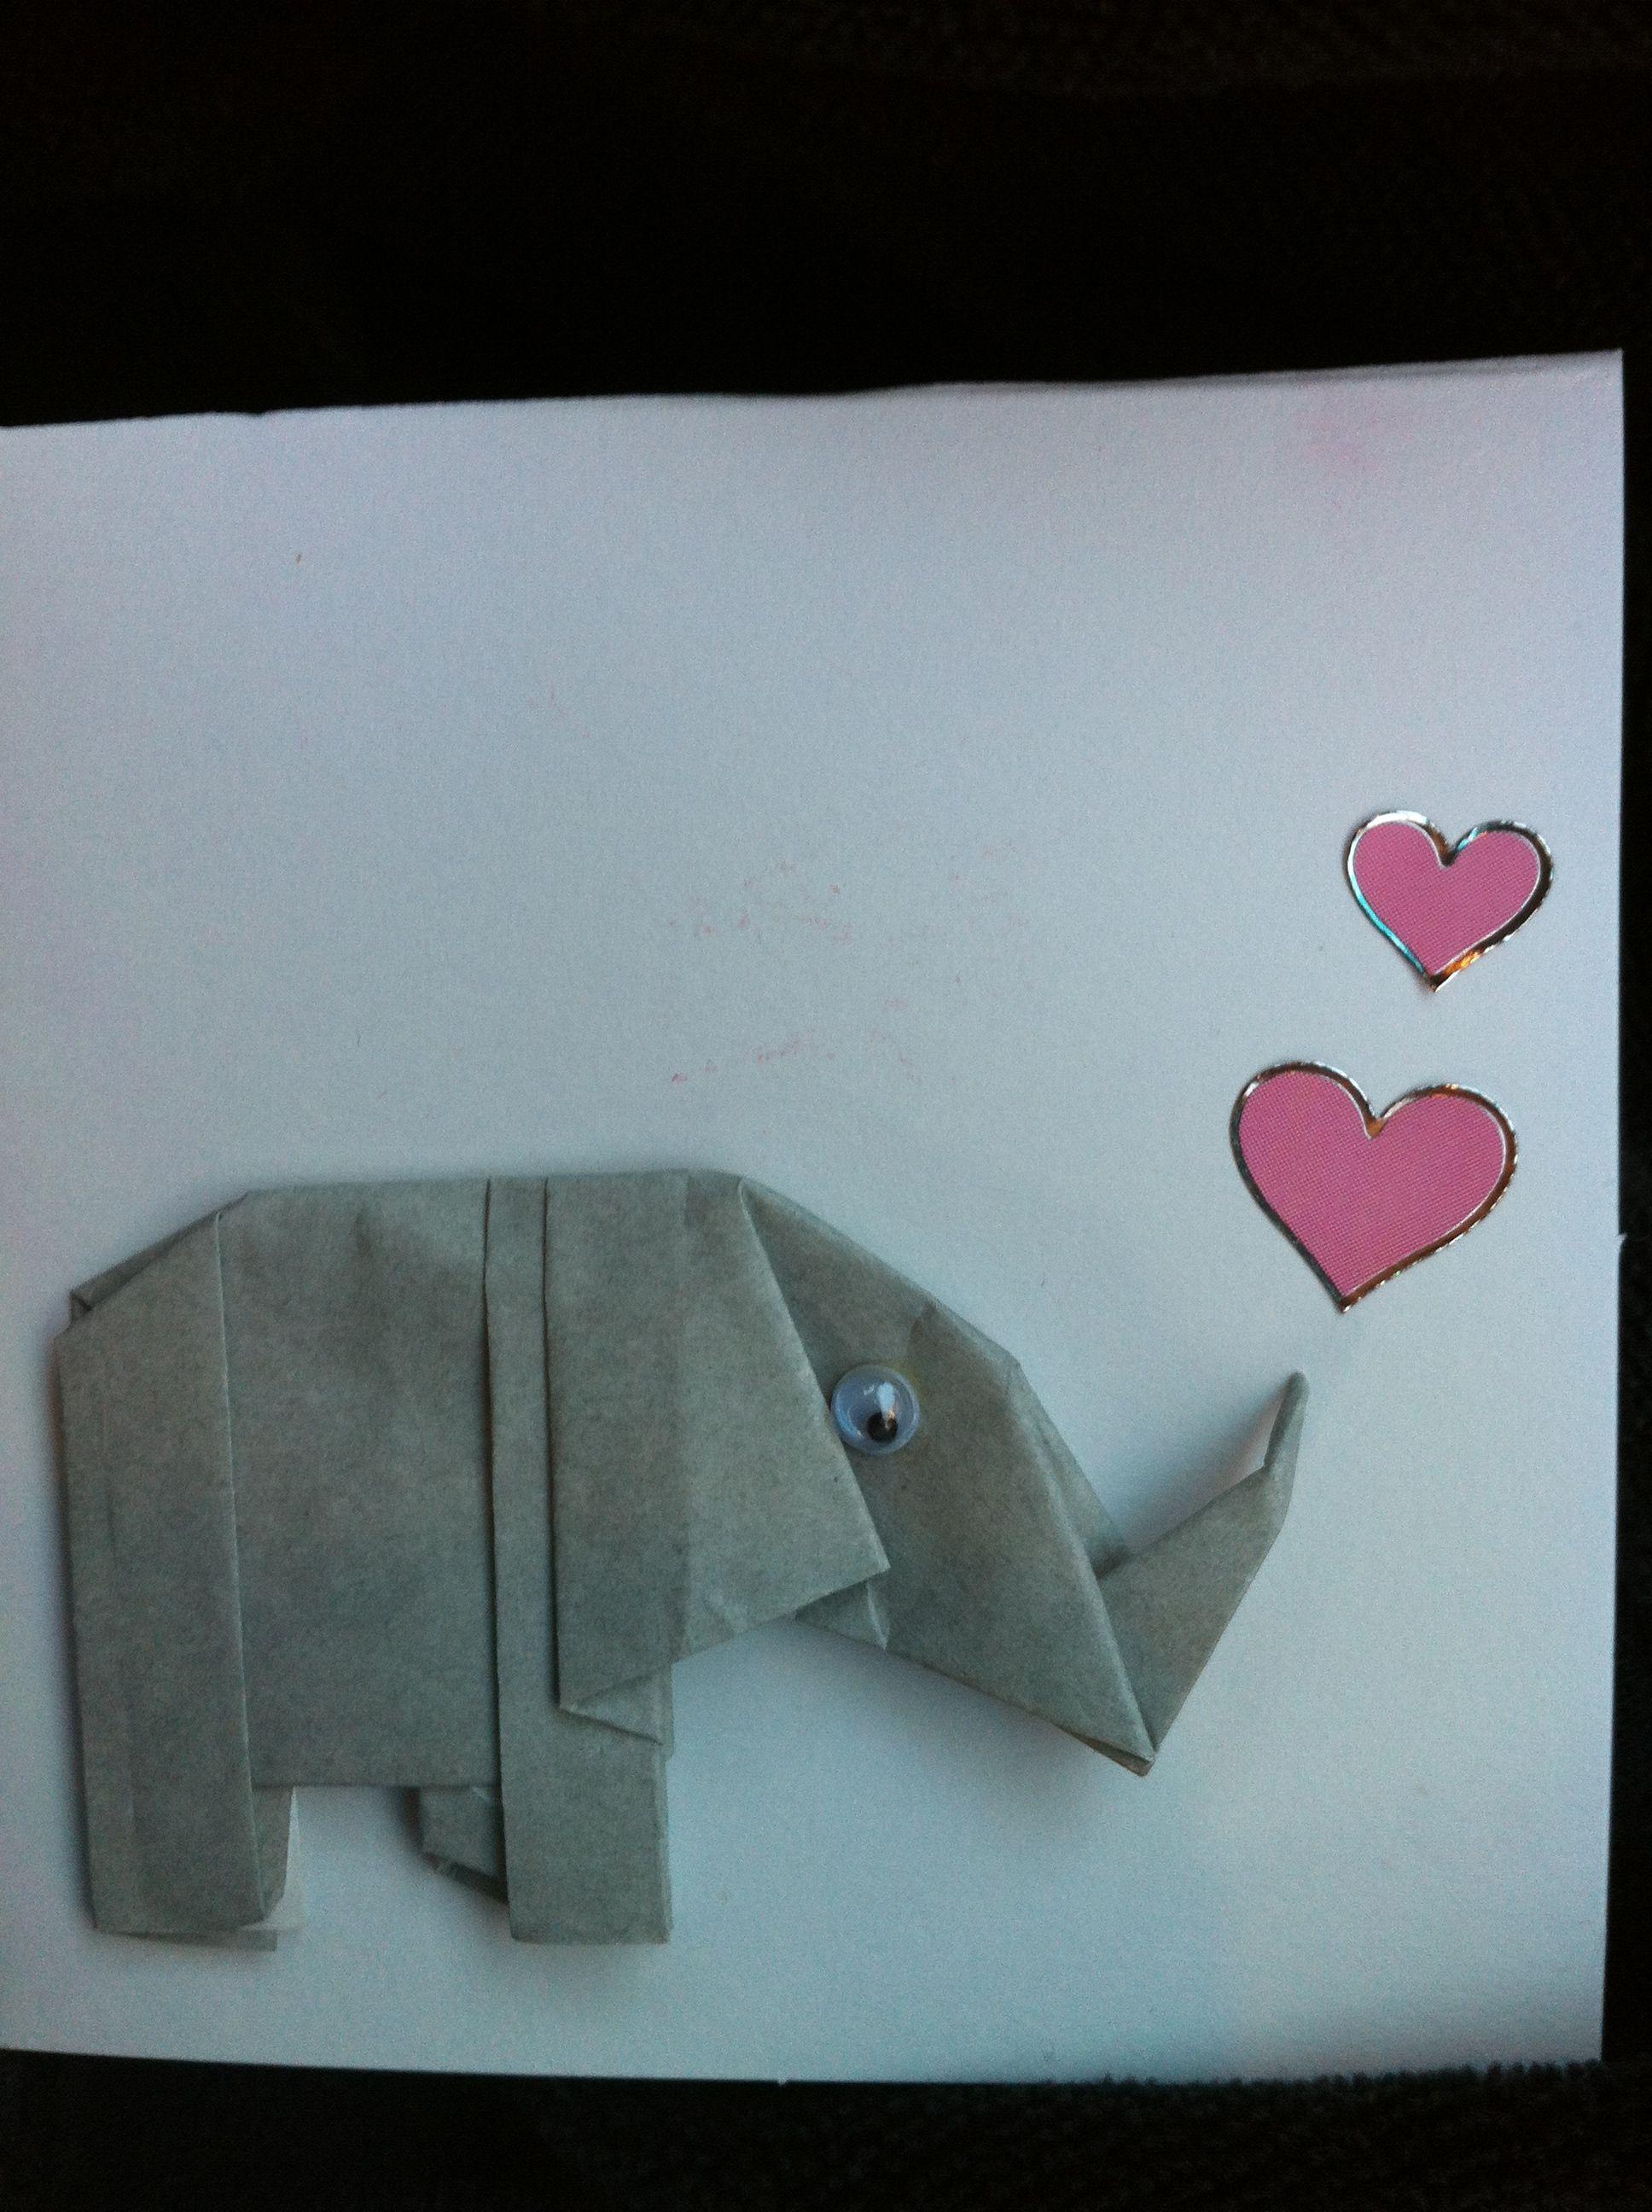 Kelan's elephant Valentine's Day cards